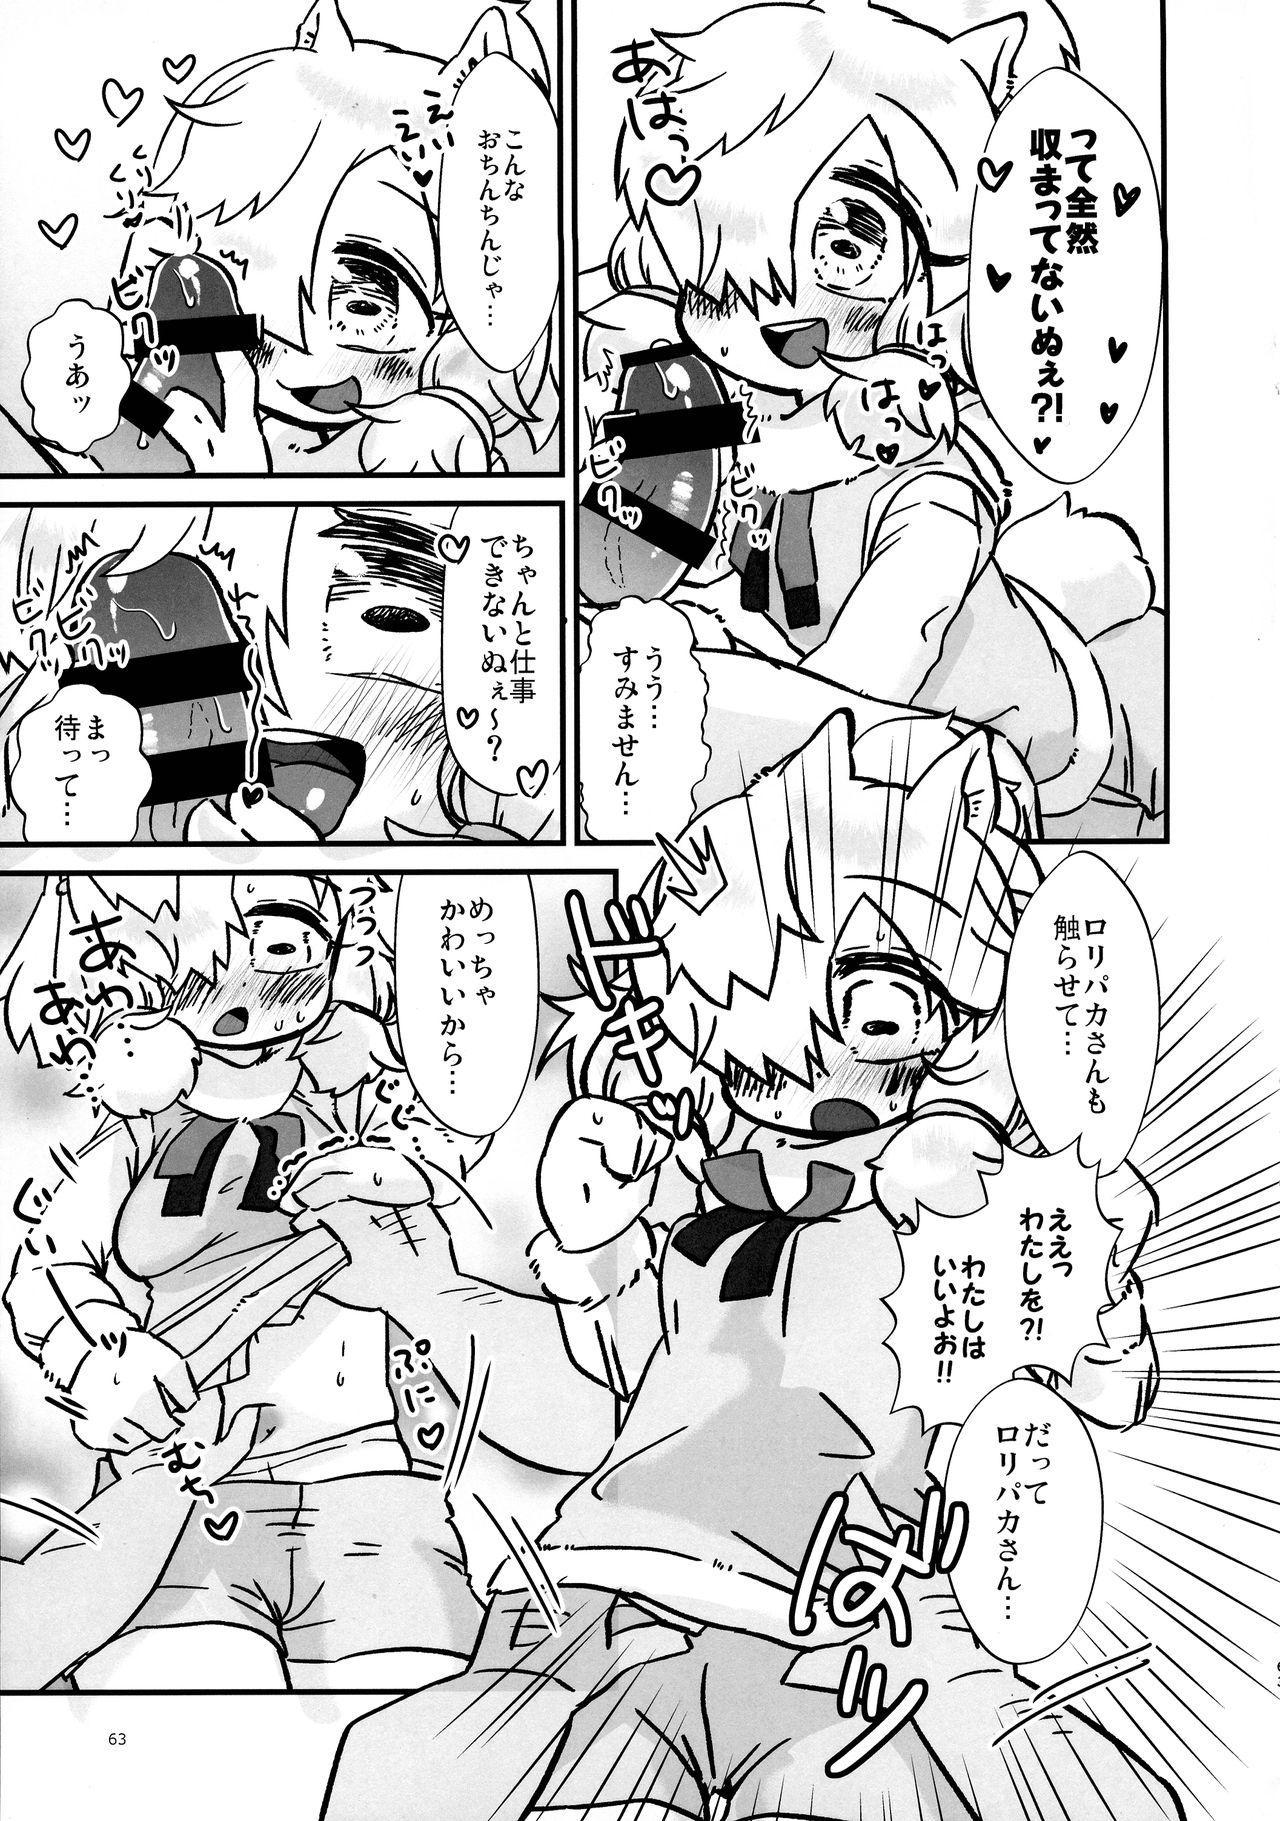 Fuwaaa! Irasshaai! Ura Iyashi no Alpaca-san Goudou 62